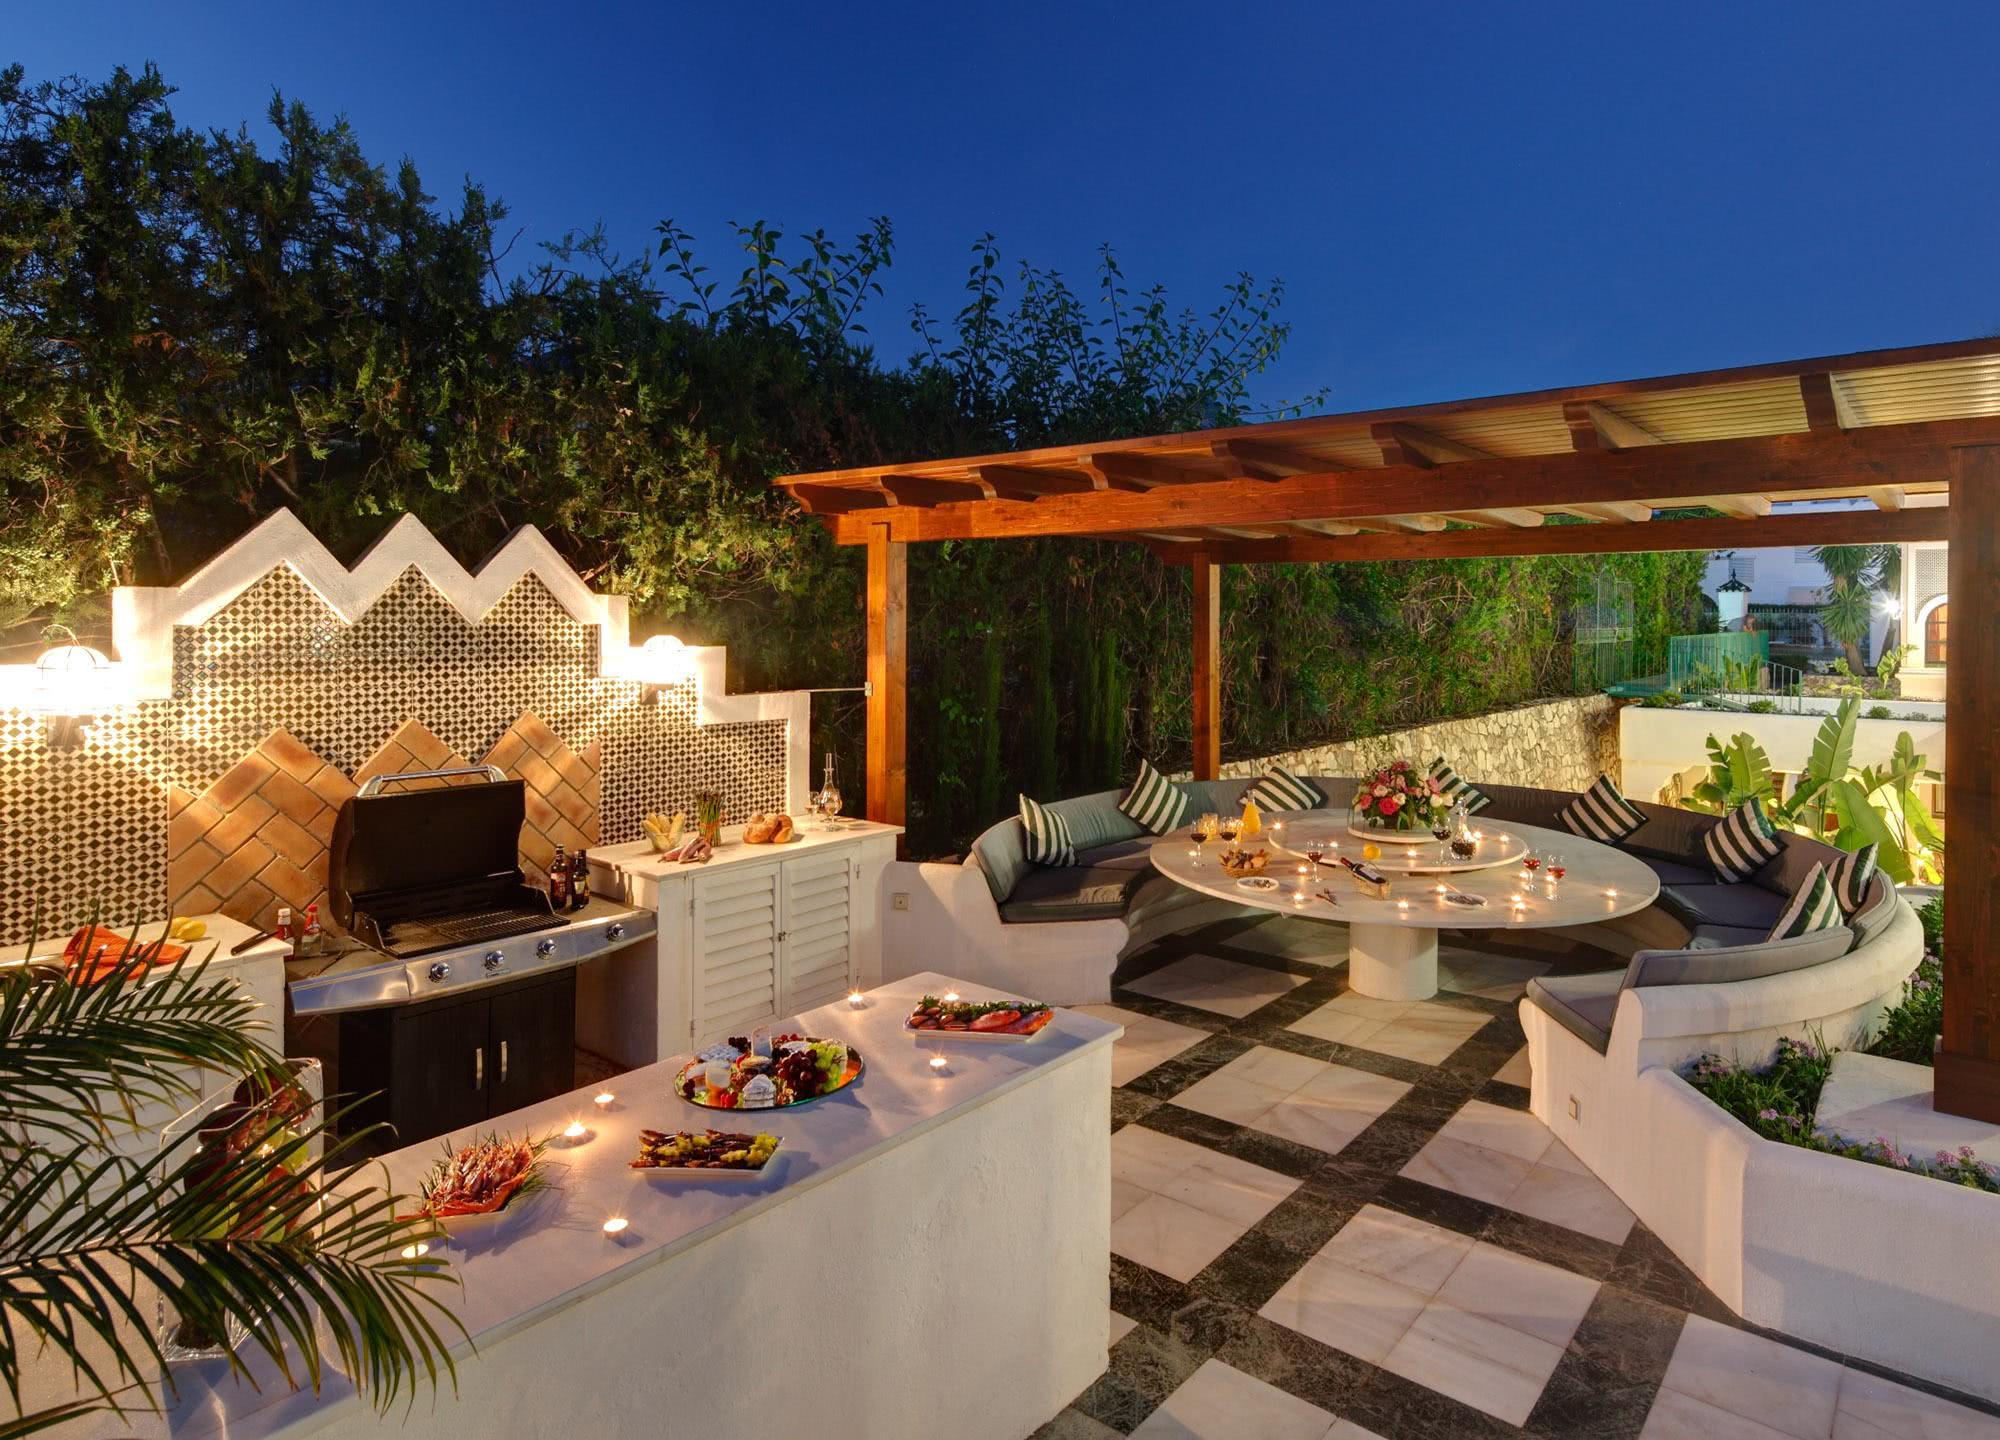 50 ambientes decorados com churrasqueira for Casa del barbecue